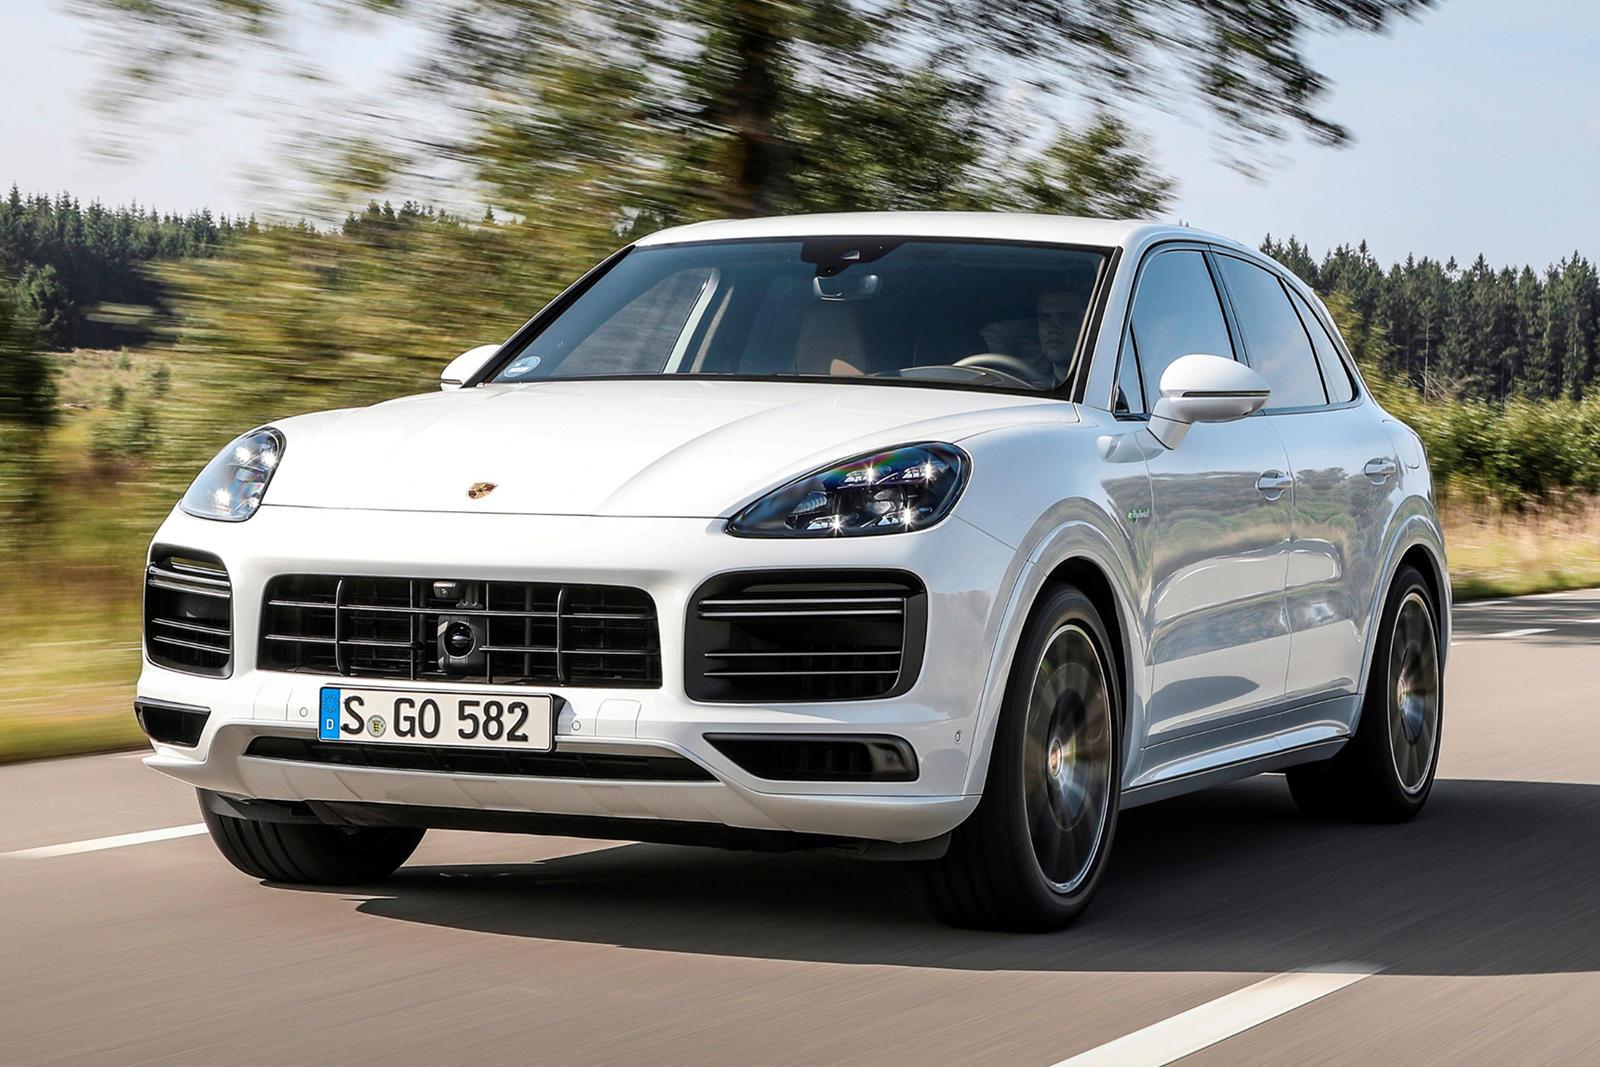 91319 2021 Porsche Cayenne E-Hybrids Are More Powerful Than Ever